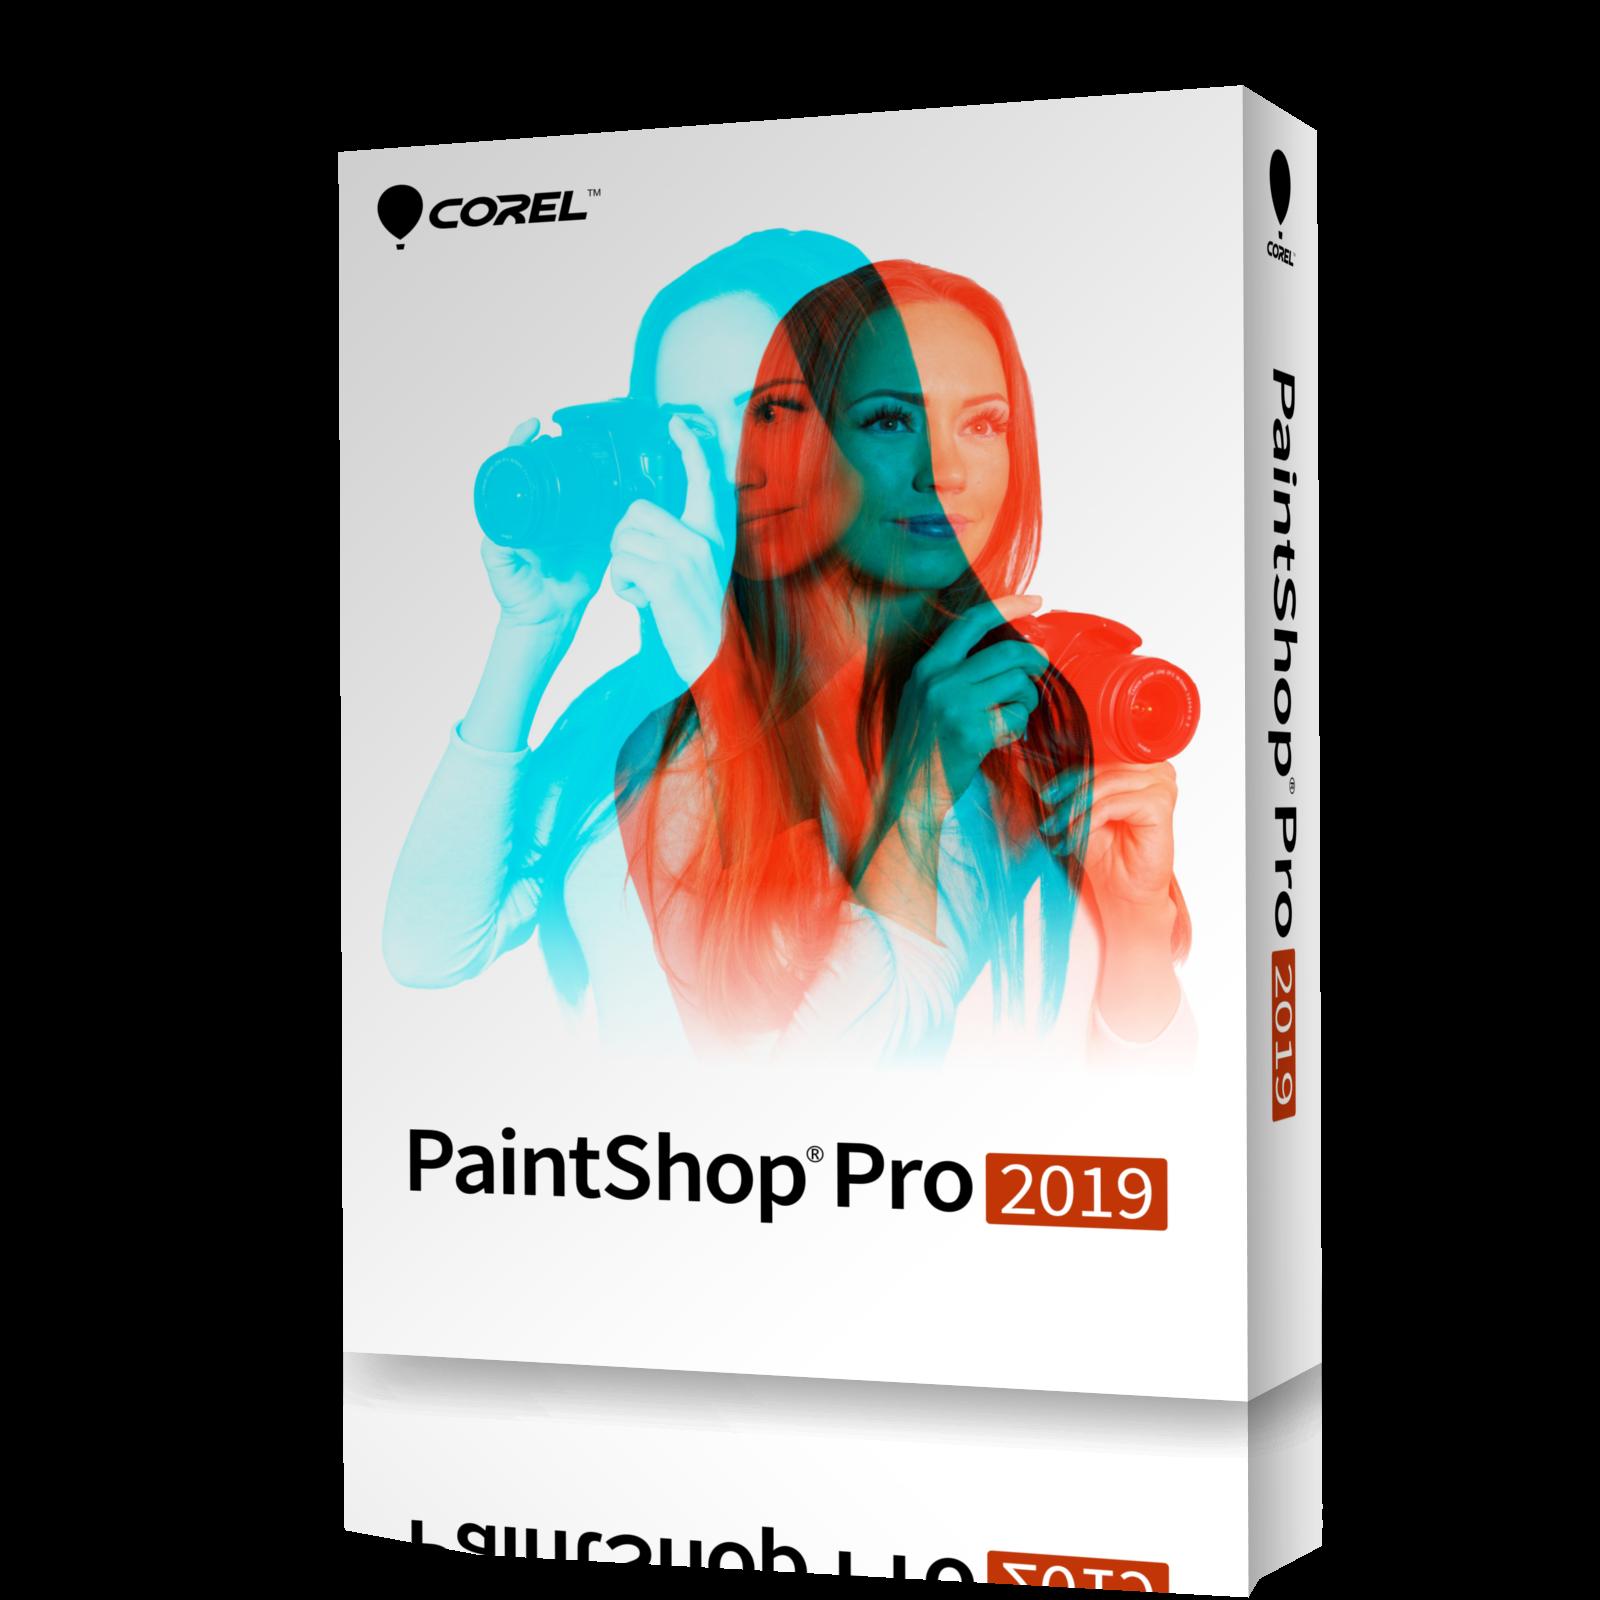 a7ecddaafd7541 NOWOŚĆ! PaintShop PRO 2019 EN - licencja komercyjna, box